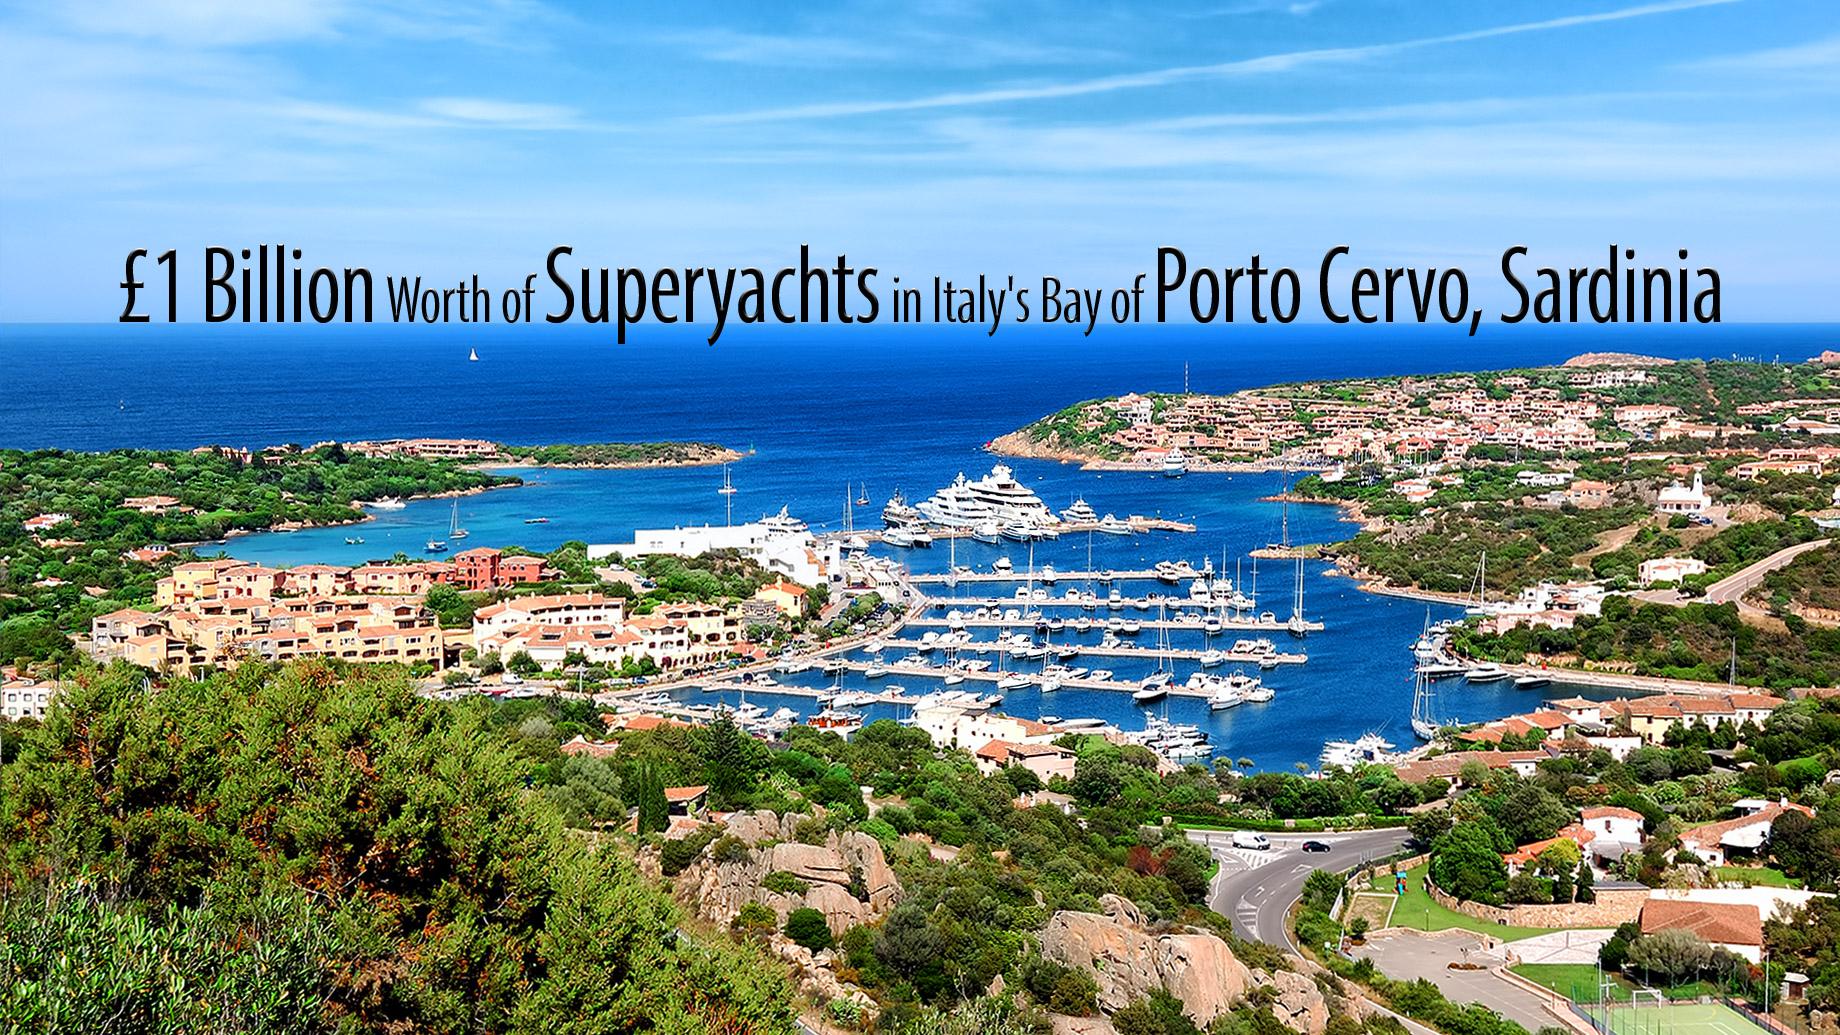 £1 Billion Worth of Superyachts in Italy's Bay of Porto Cervo, Sardinia